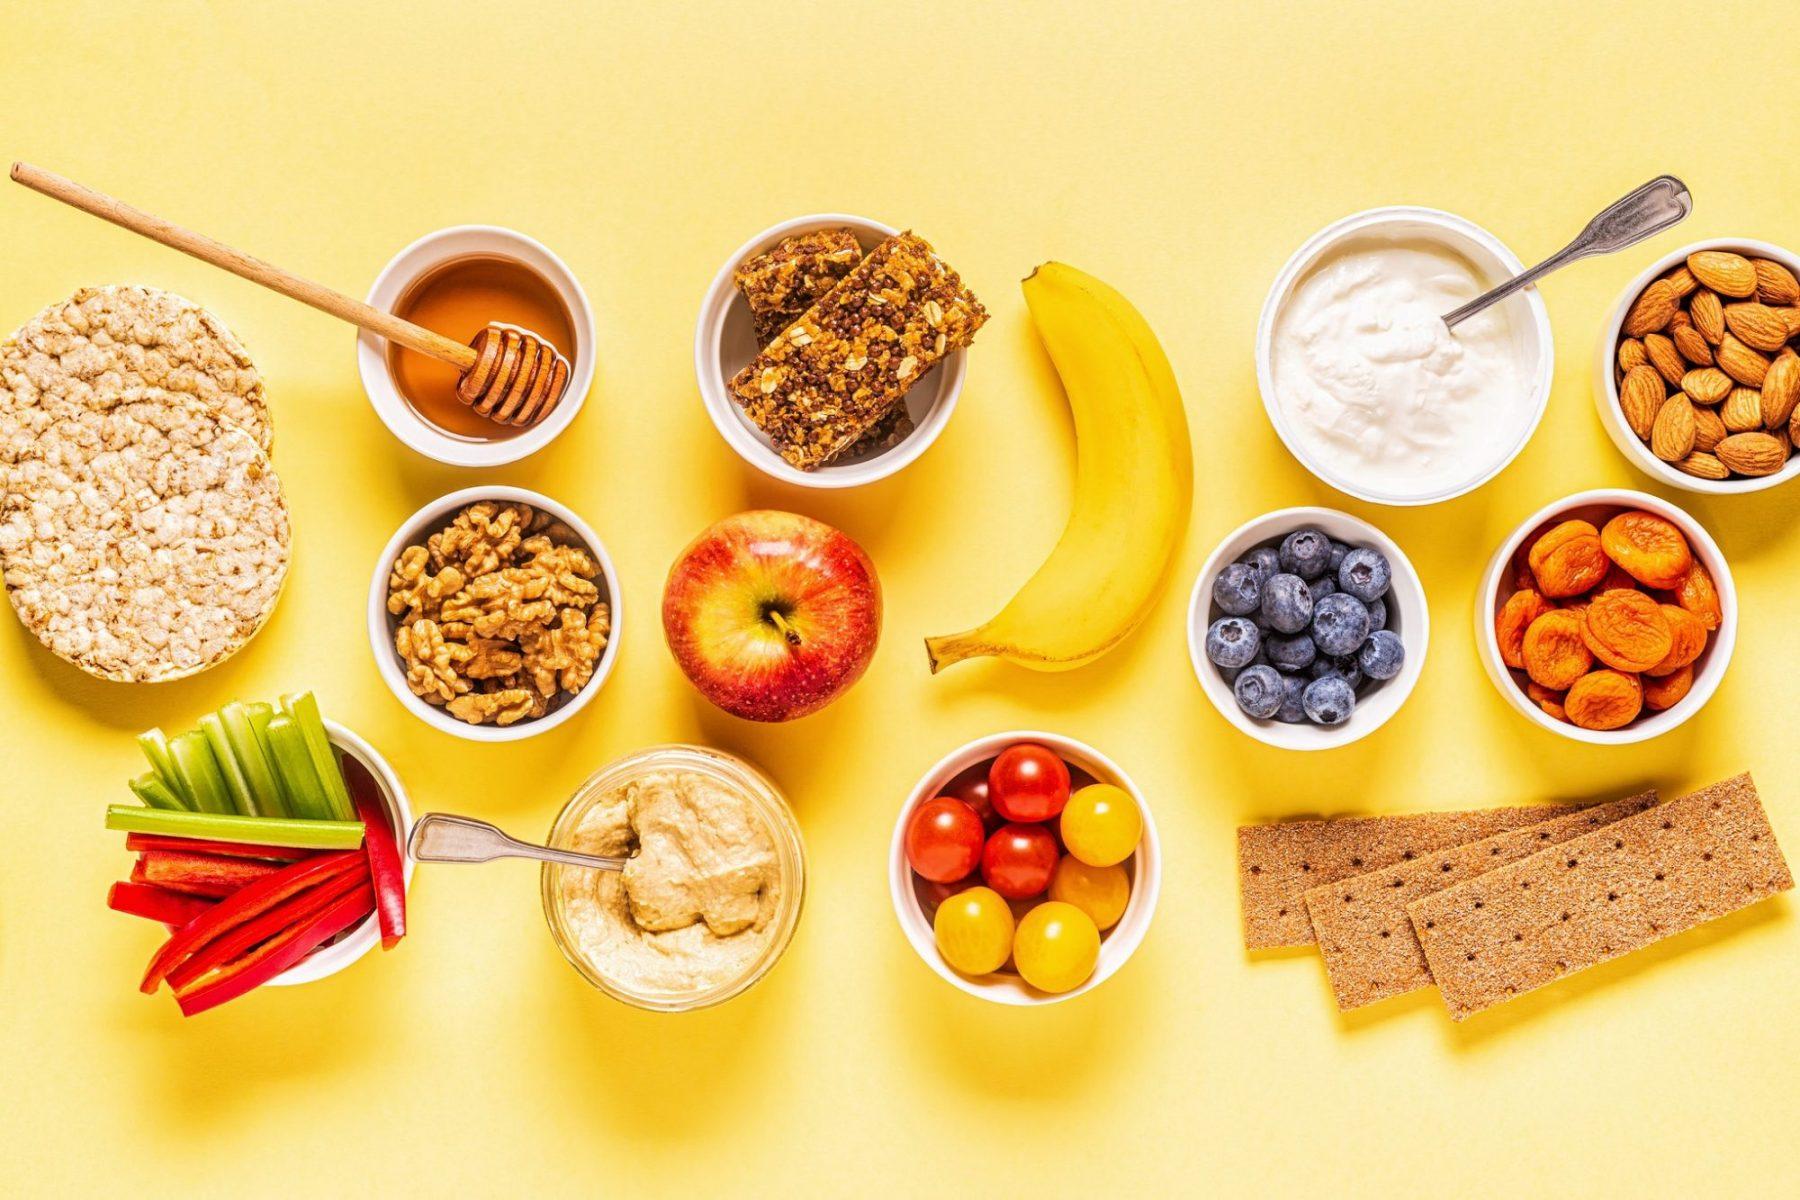 Atlanta Alternative Snack Choices | Better-for-You | Healthy Break Room